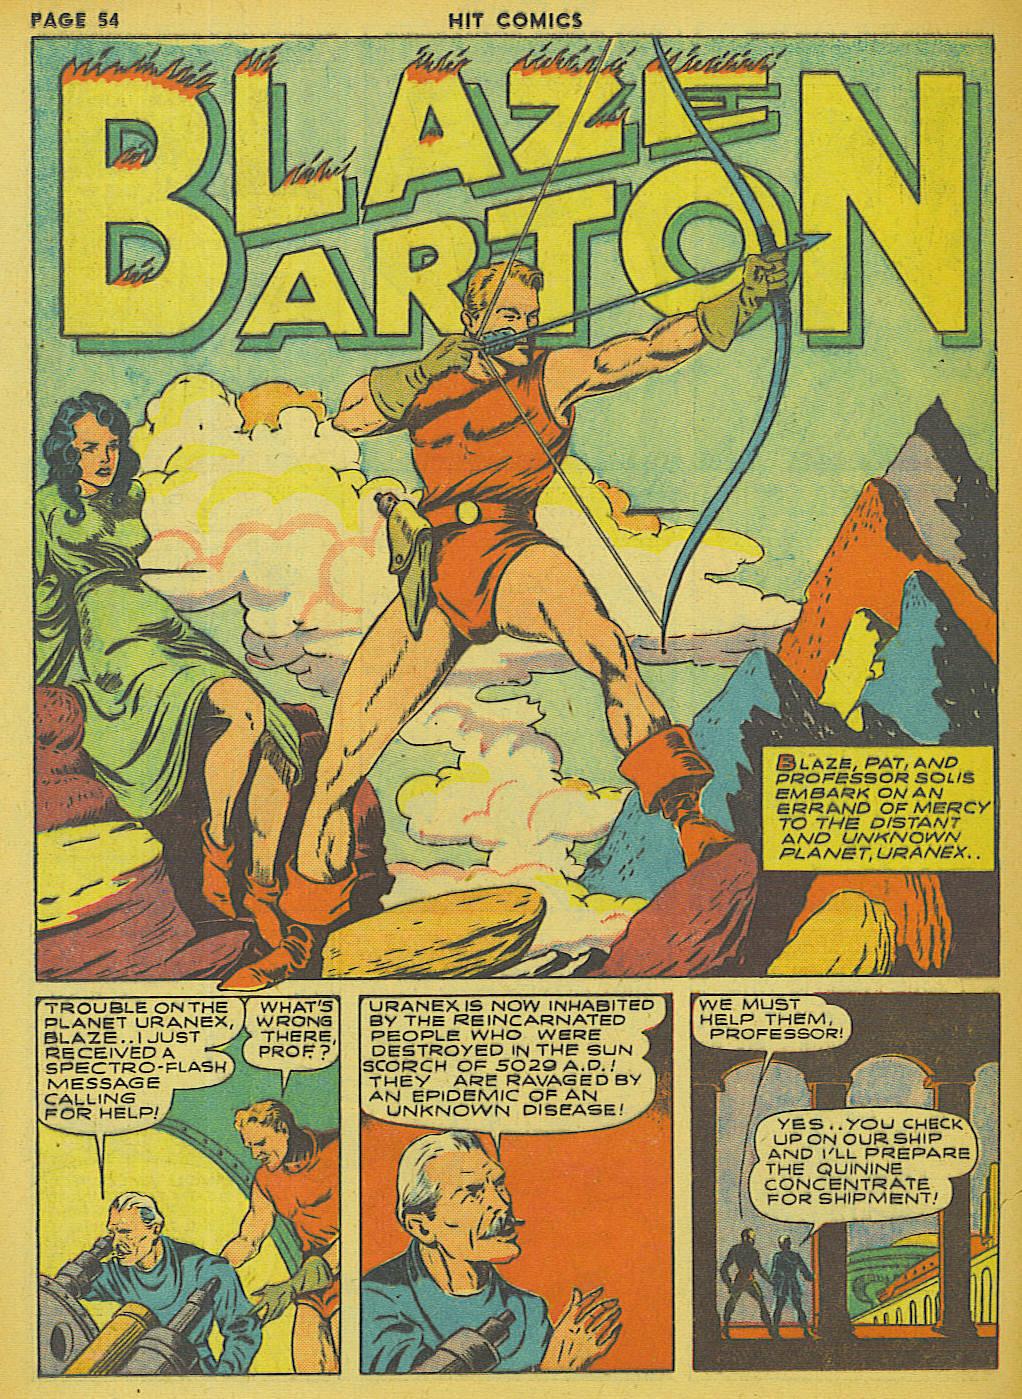 Read online Hit Comics comic -  Issue #13 - 56